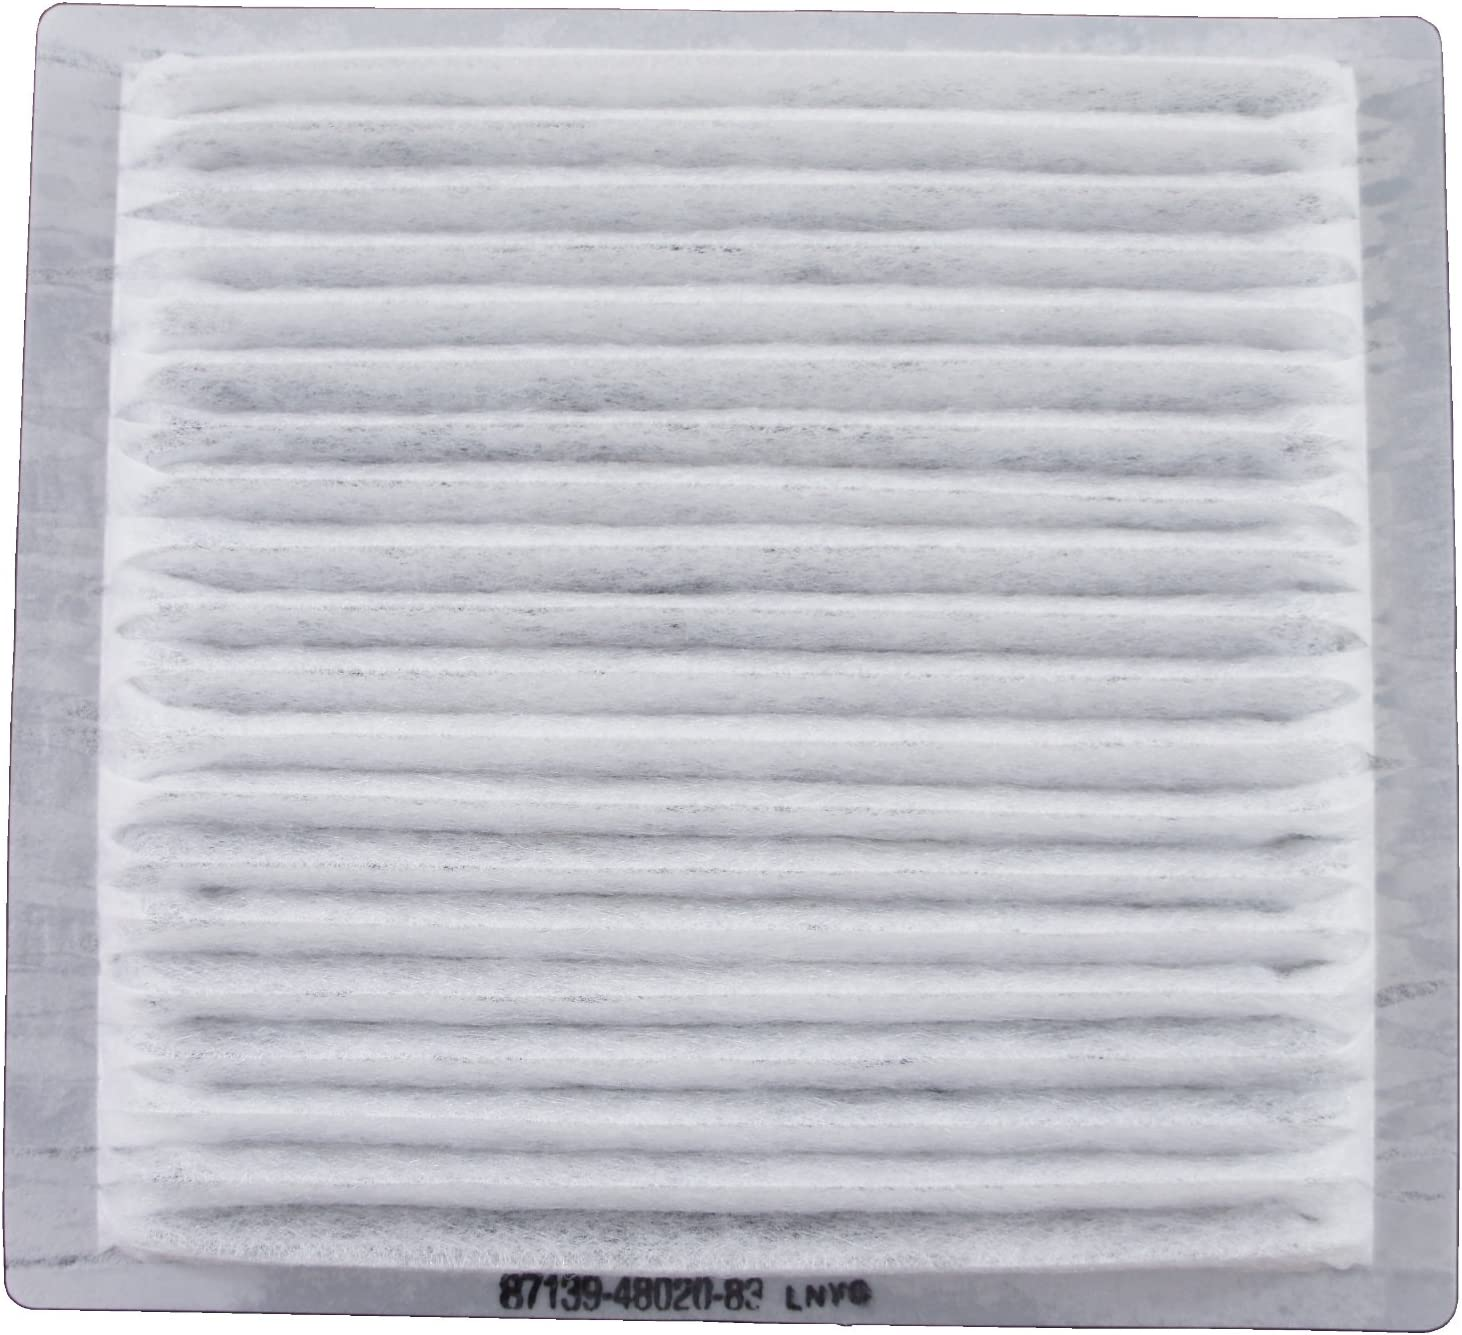 Toyota Genuine Parts 87139-48020-83 Cabin Air Filter